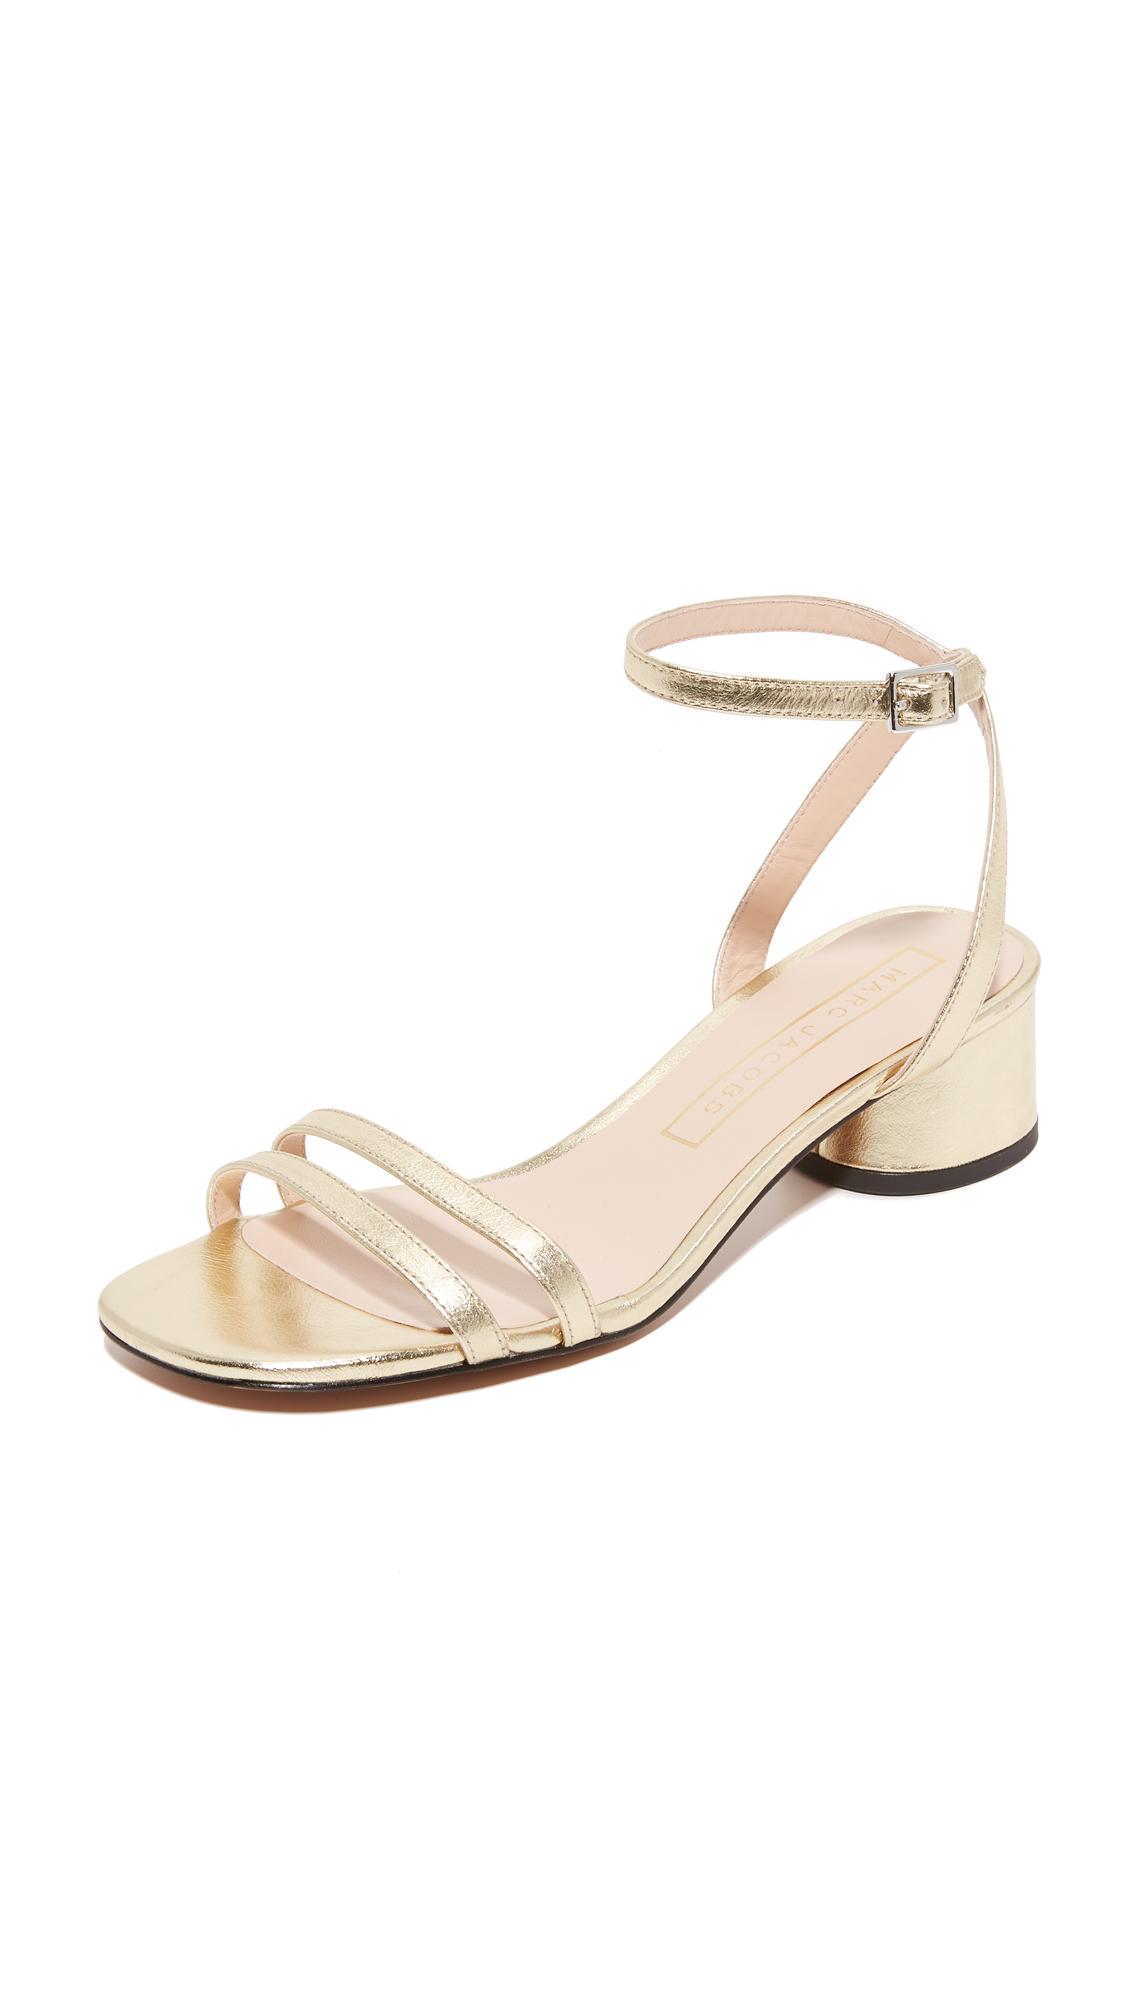 marc jacobs female marc jacobs olivia city sandals gold